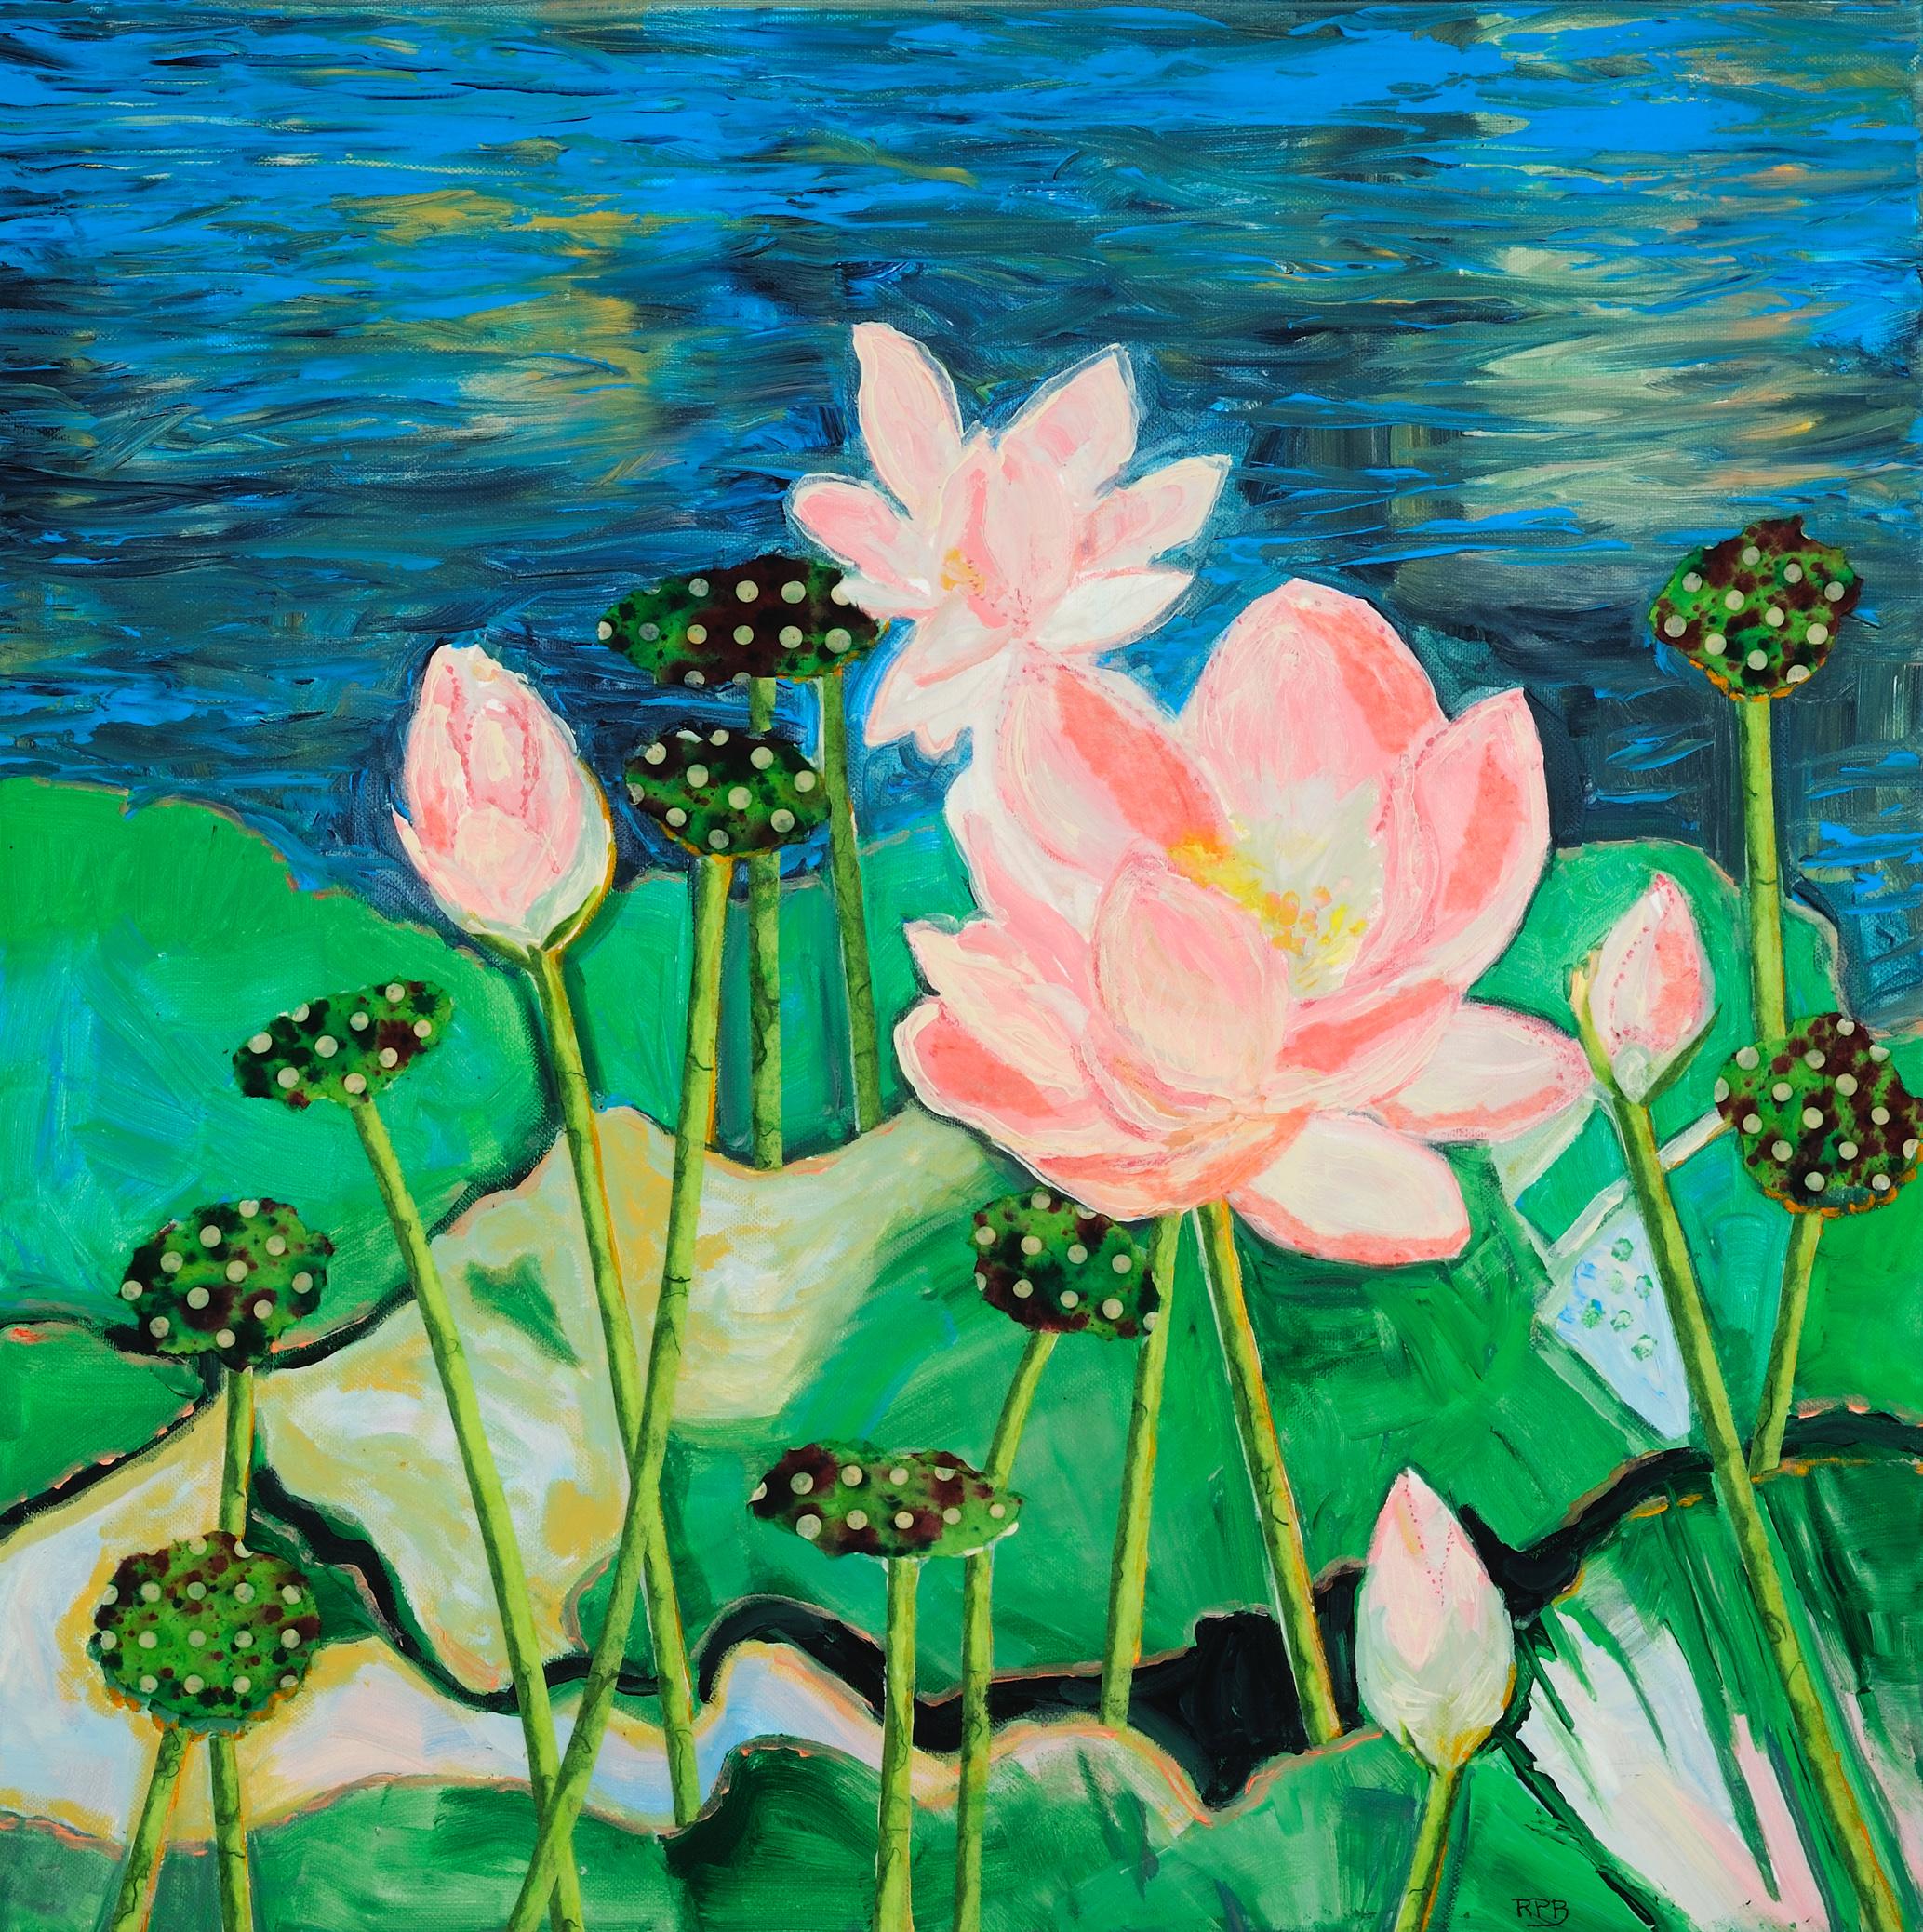 """Lotus Pond"" - 24"" x 24"" - Mixed Media"